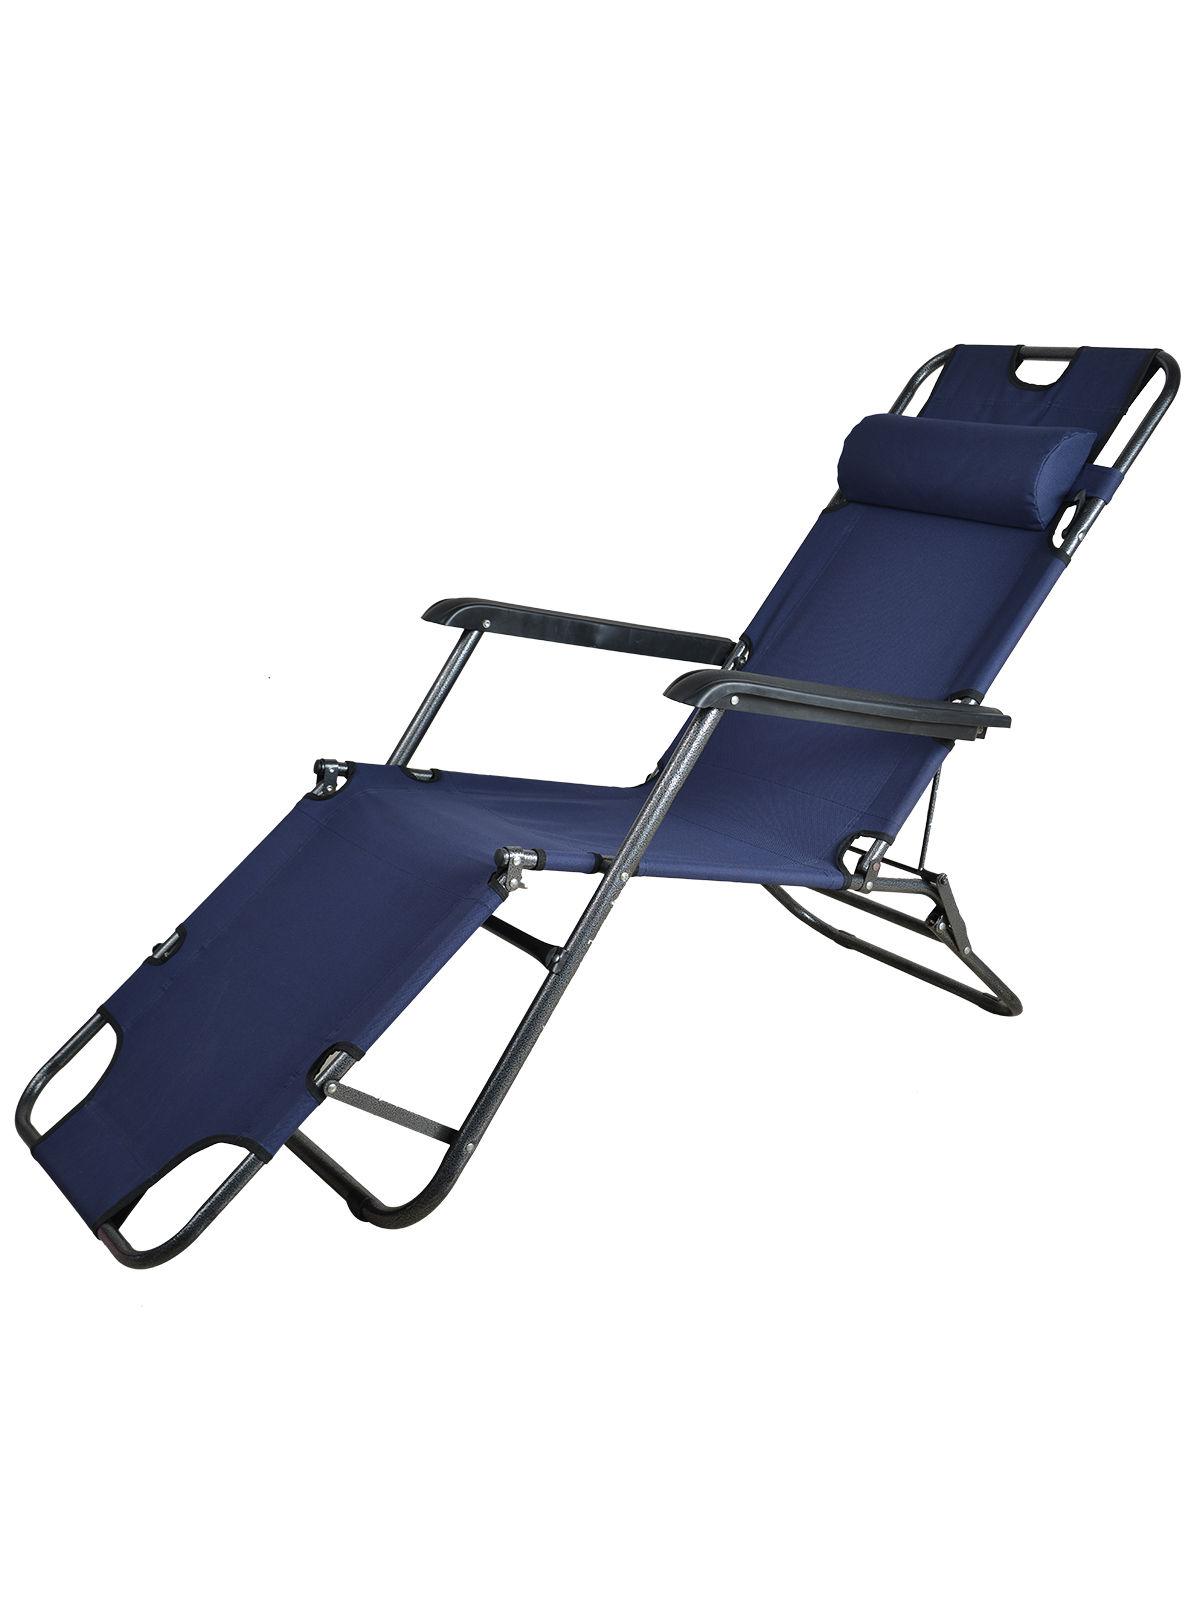 buy easy chair online folding rubber feet kawachi comfort reclining at best